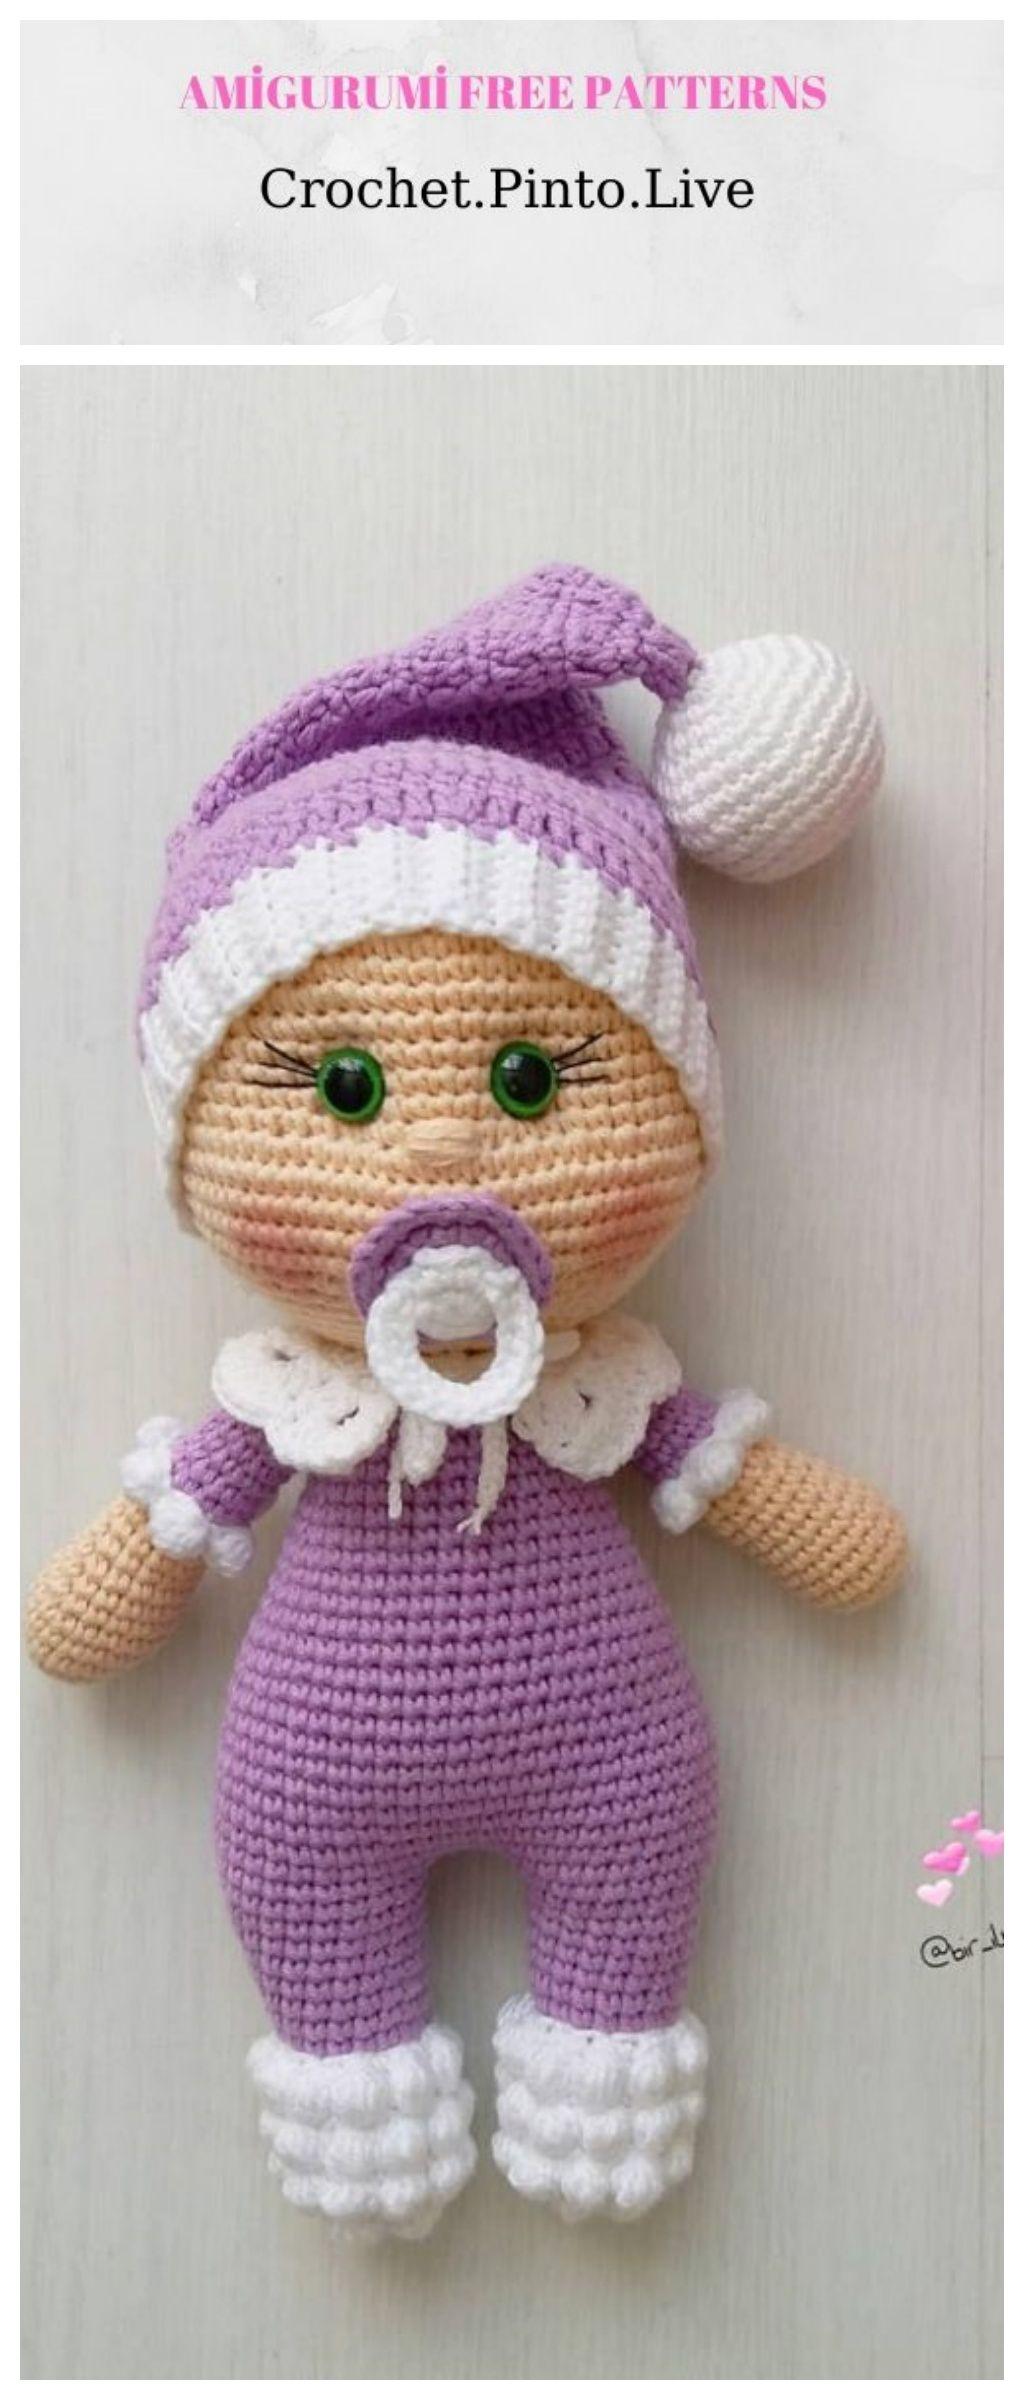 Amigurumi Cute Doll Free Crochet Pattern em 2020 | Boneca ... | 2400x1024